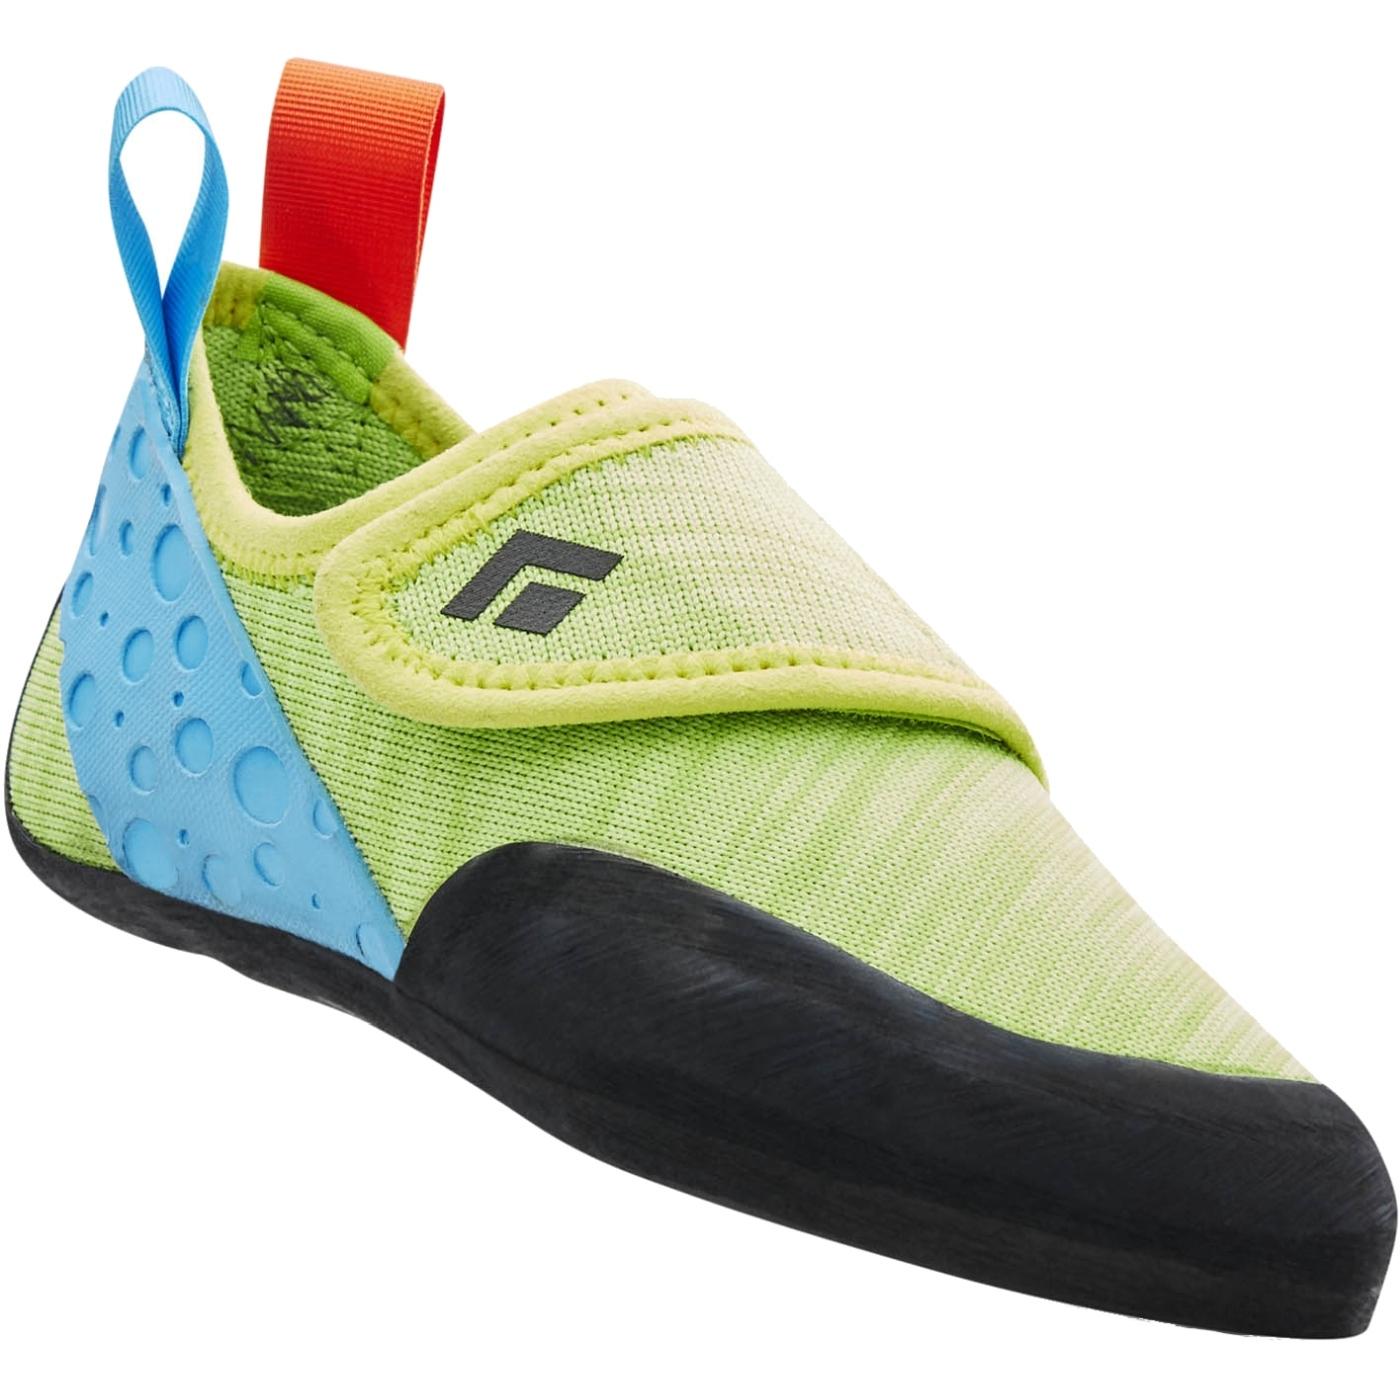 Image of Black Diamond Kid's Momentum Climbing Shoes - Macaw